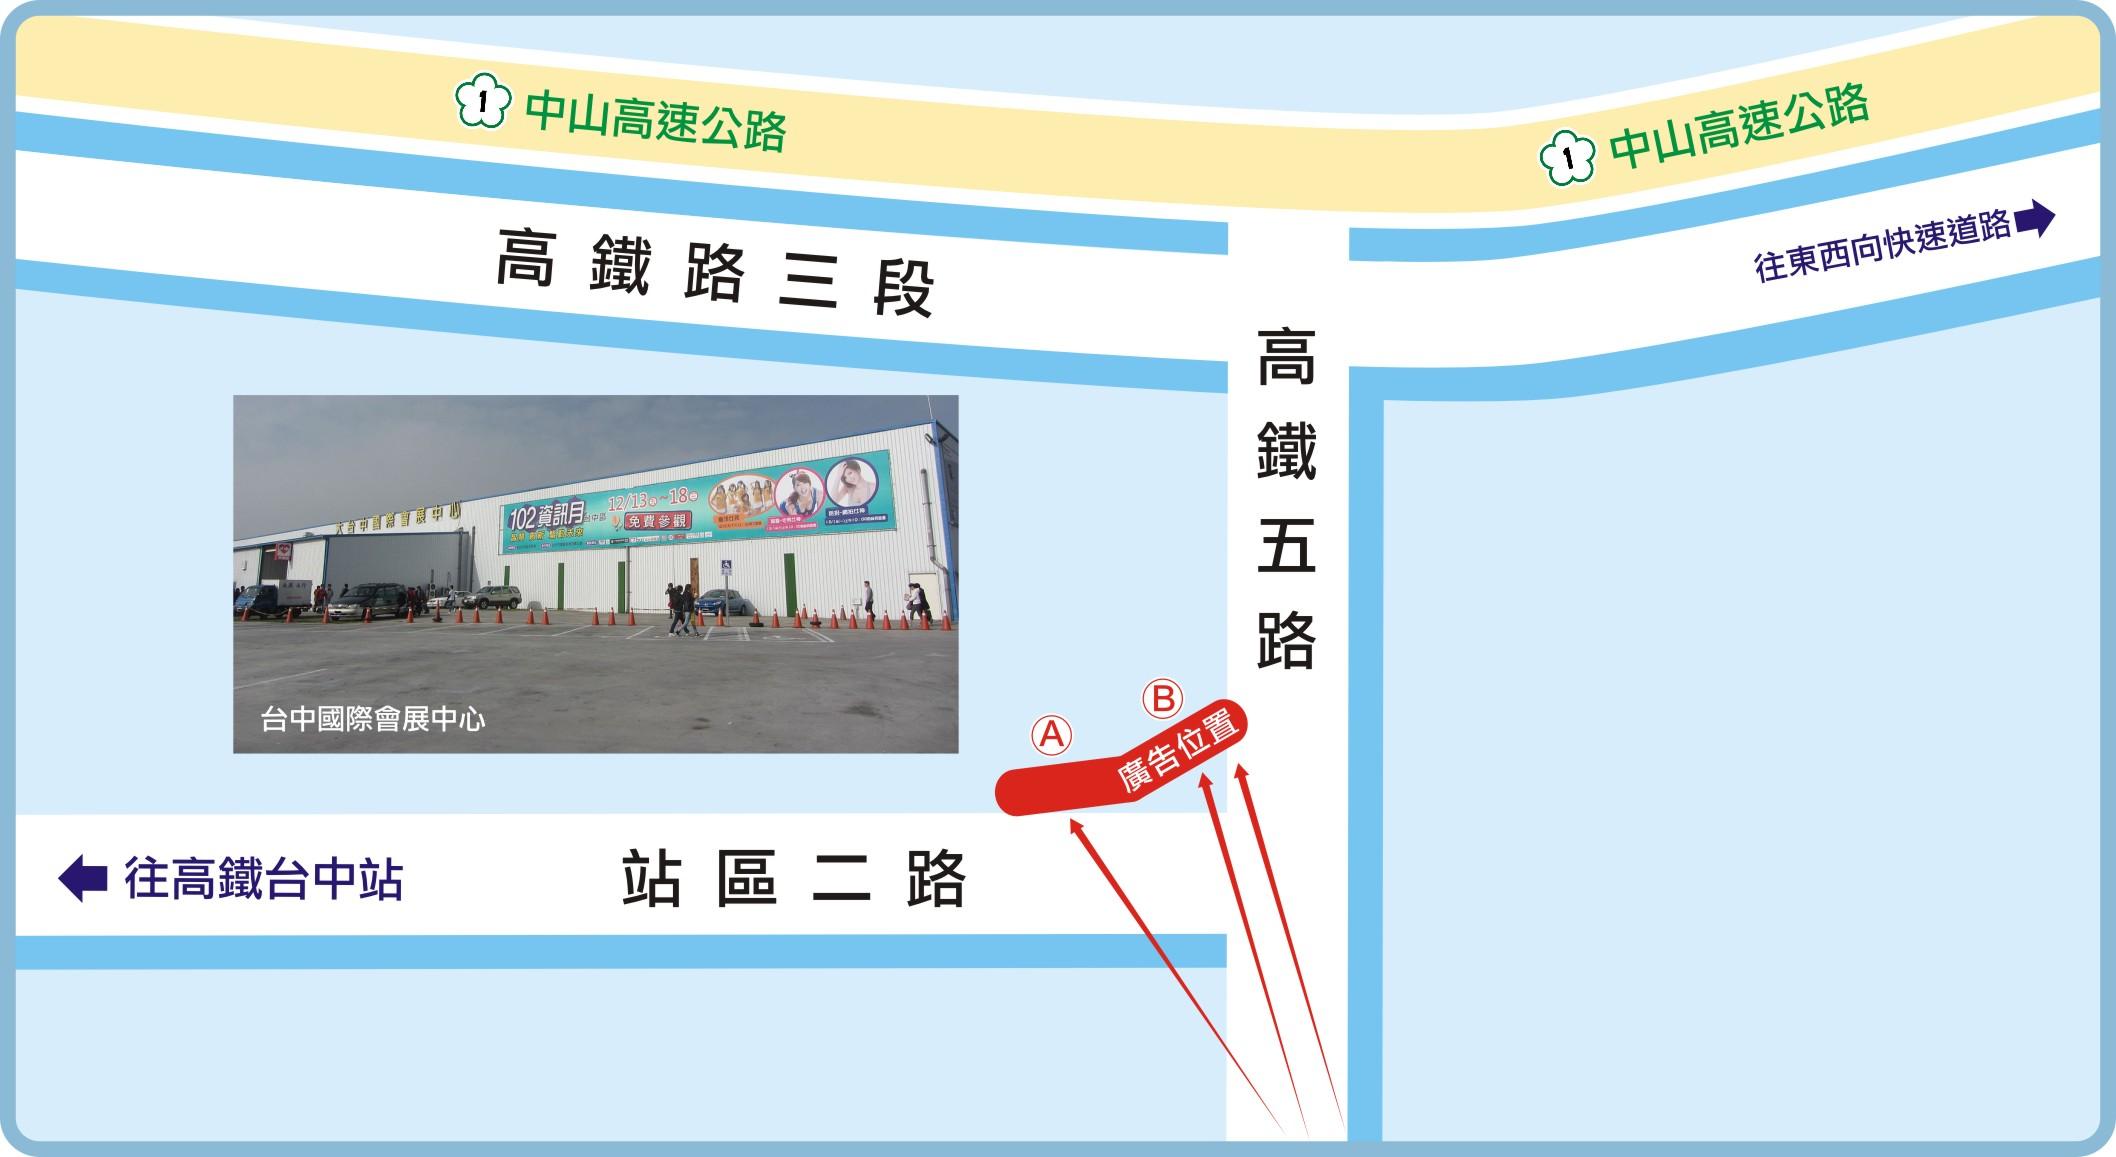 H-0398AB-台中國際會展中心、台中烏日高鐵站